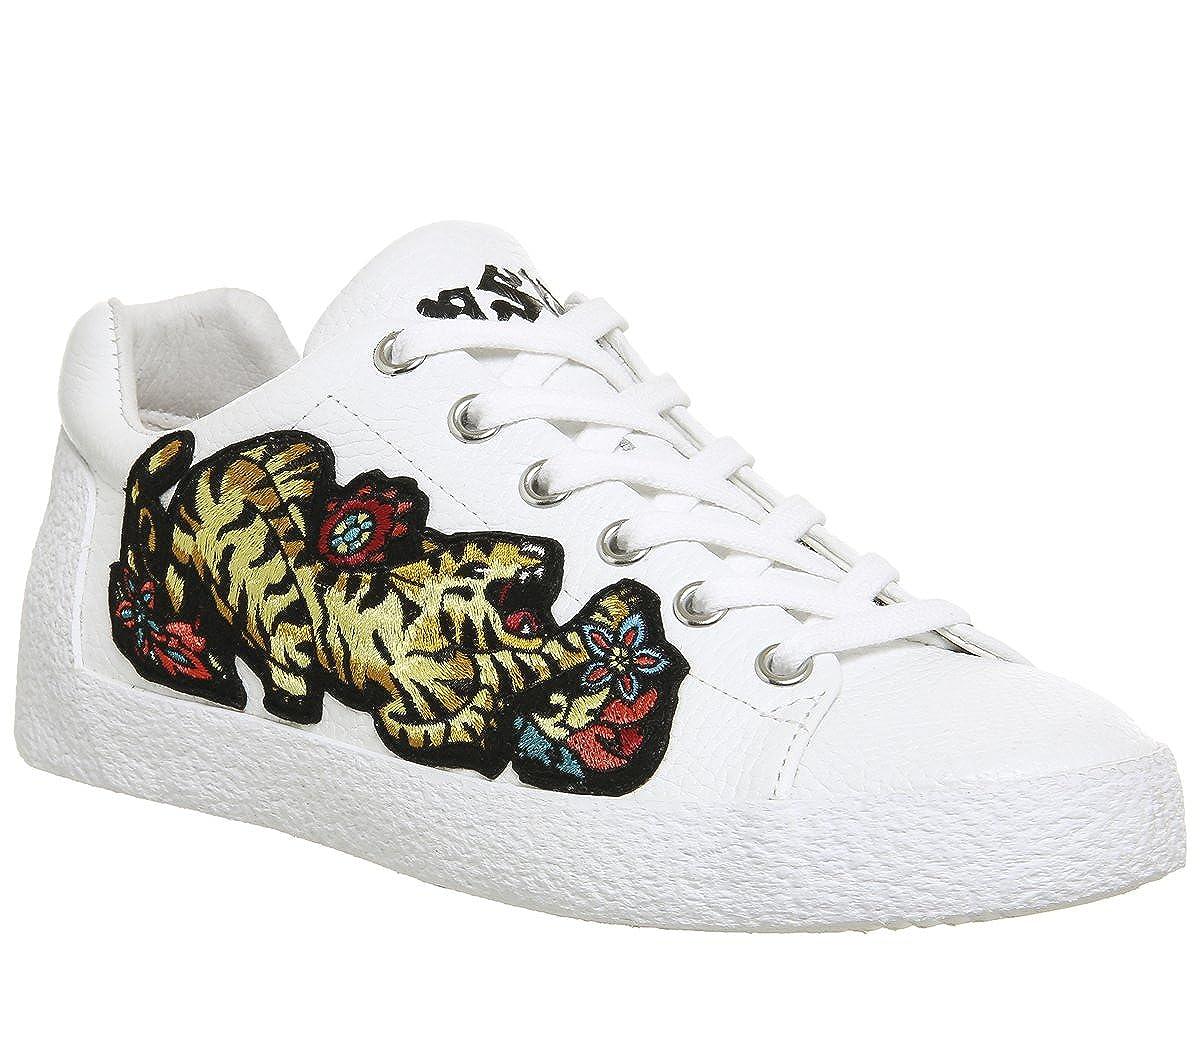 Ash Schuhe Niagara Weiß Leder Turnschuhe Damen